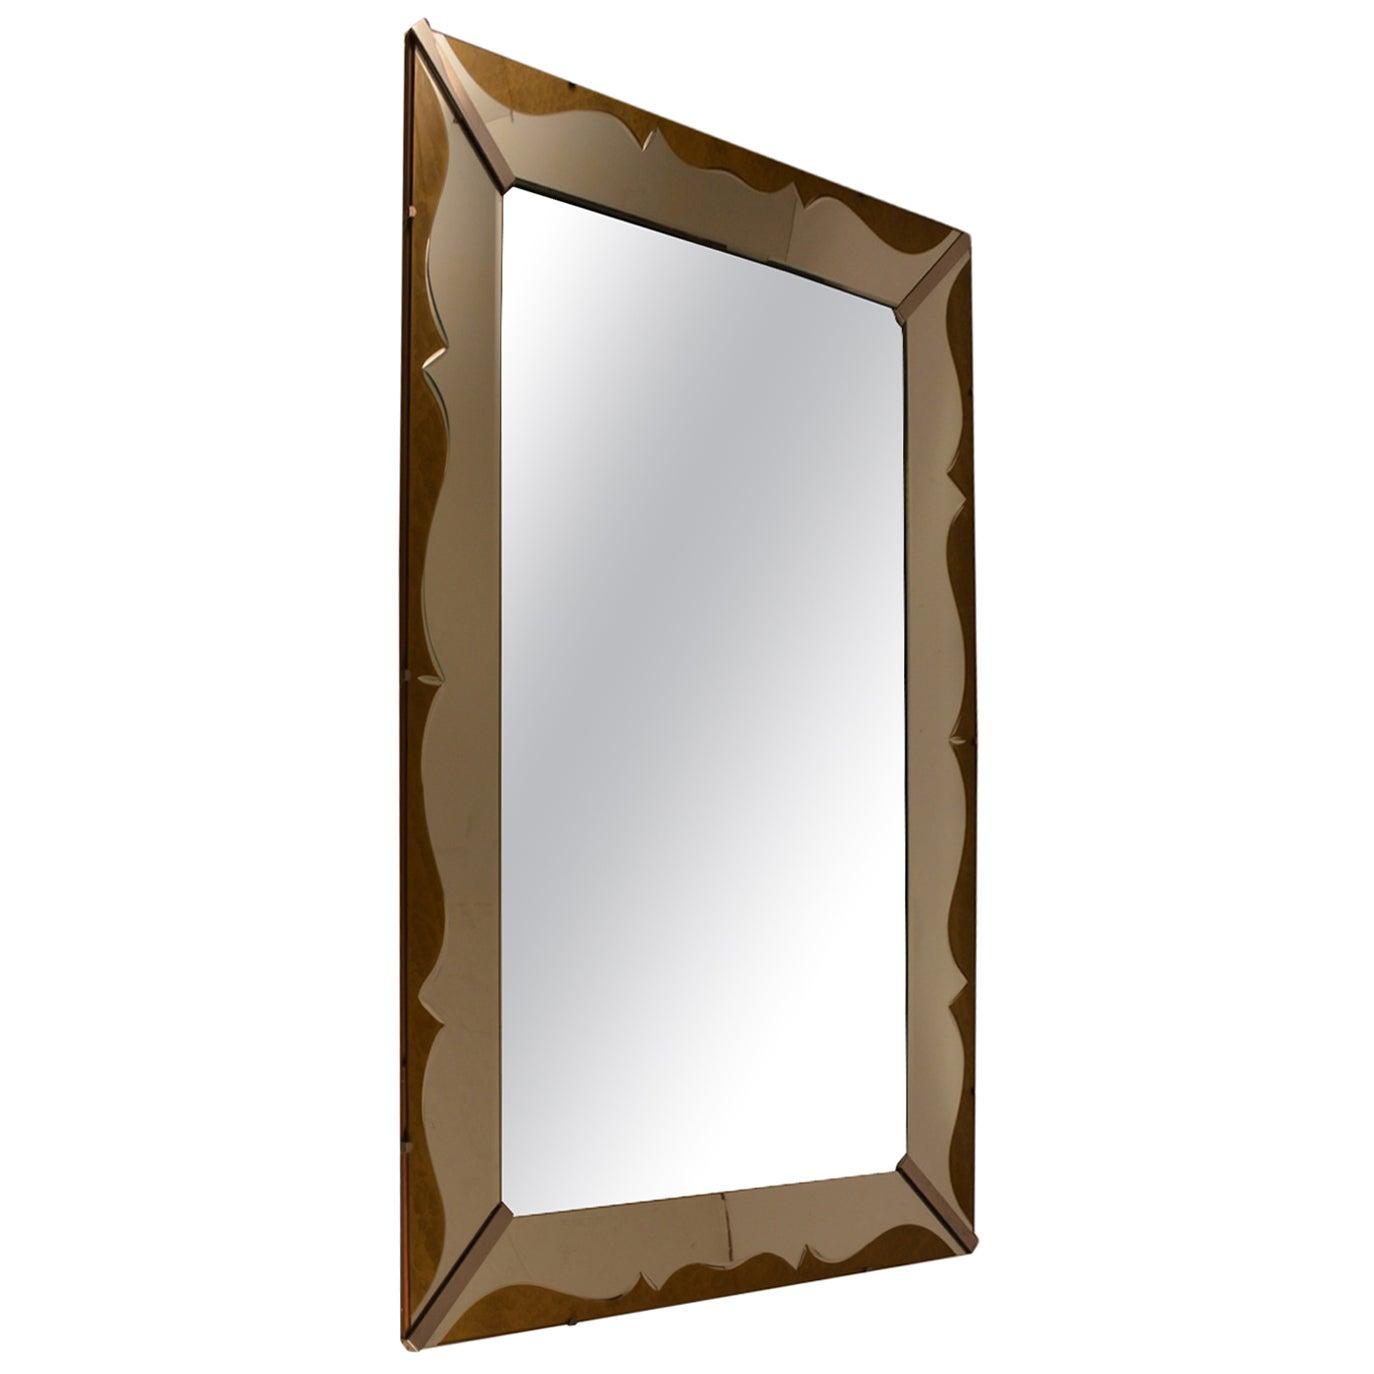 Art Deco Venetian Style Mirror with Decorative Églomisé Trim